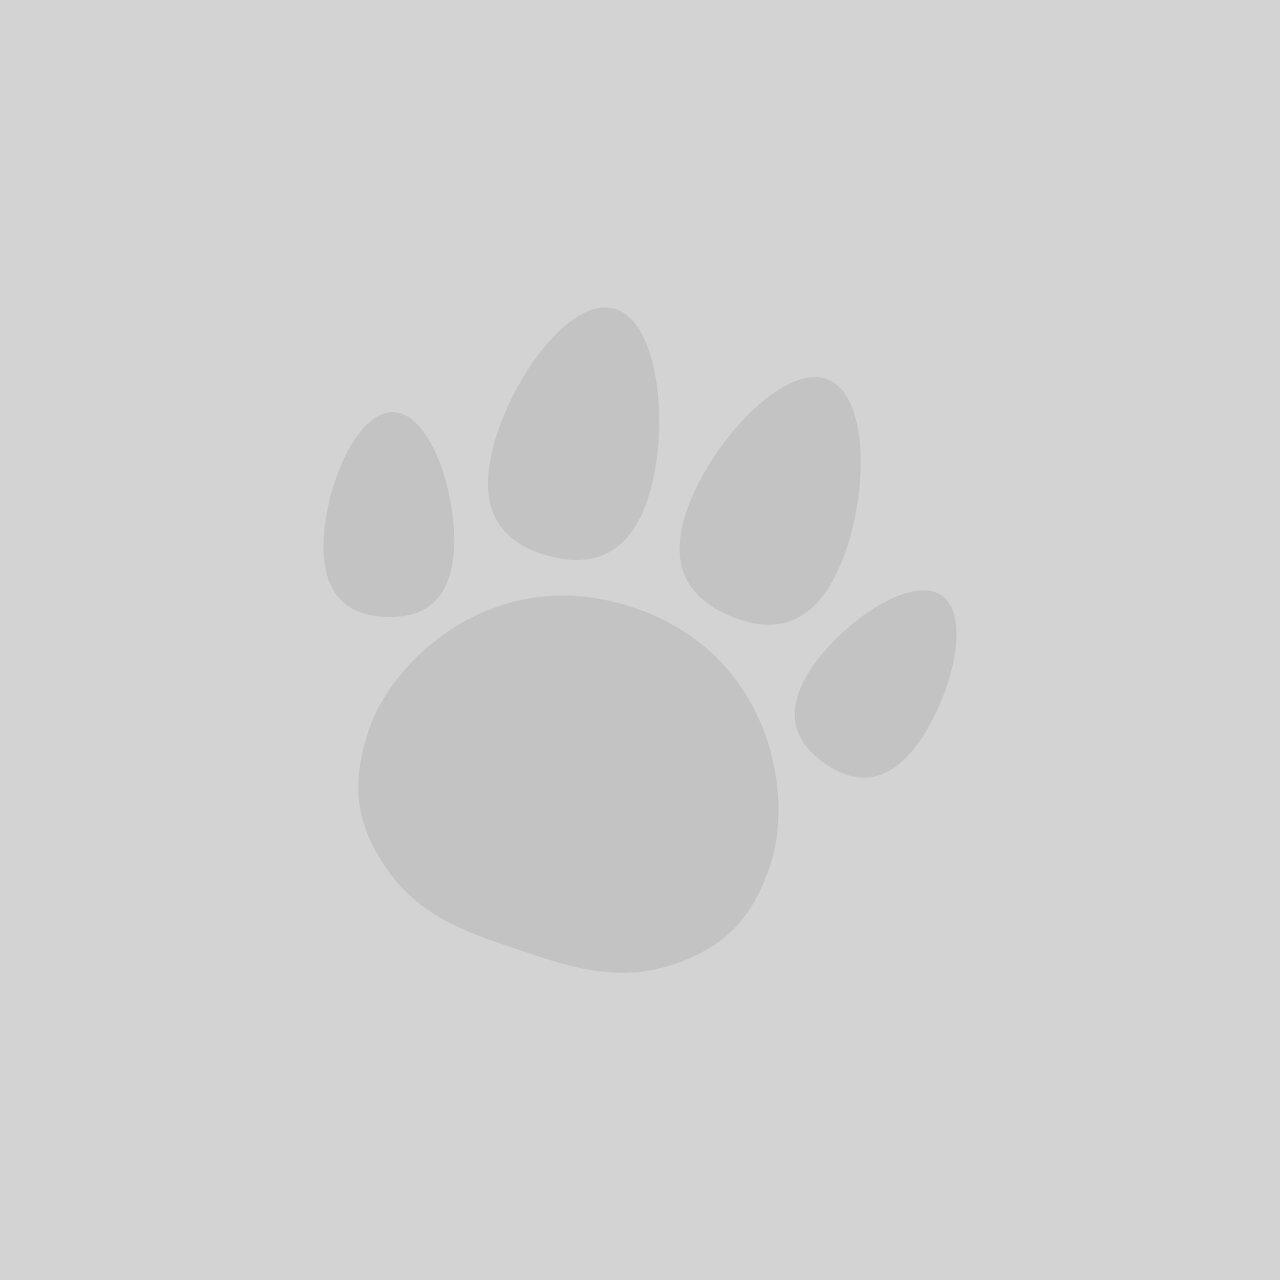 Pedigree Dentastix Twice Weekly Large Dog Dental Chews 3 Pack